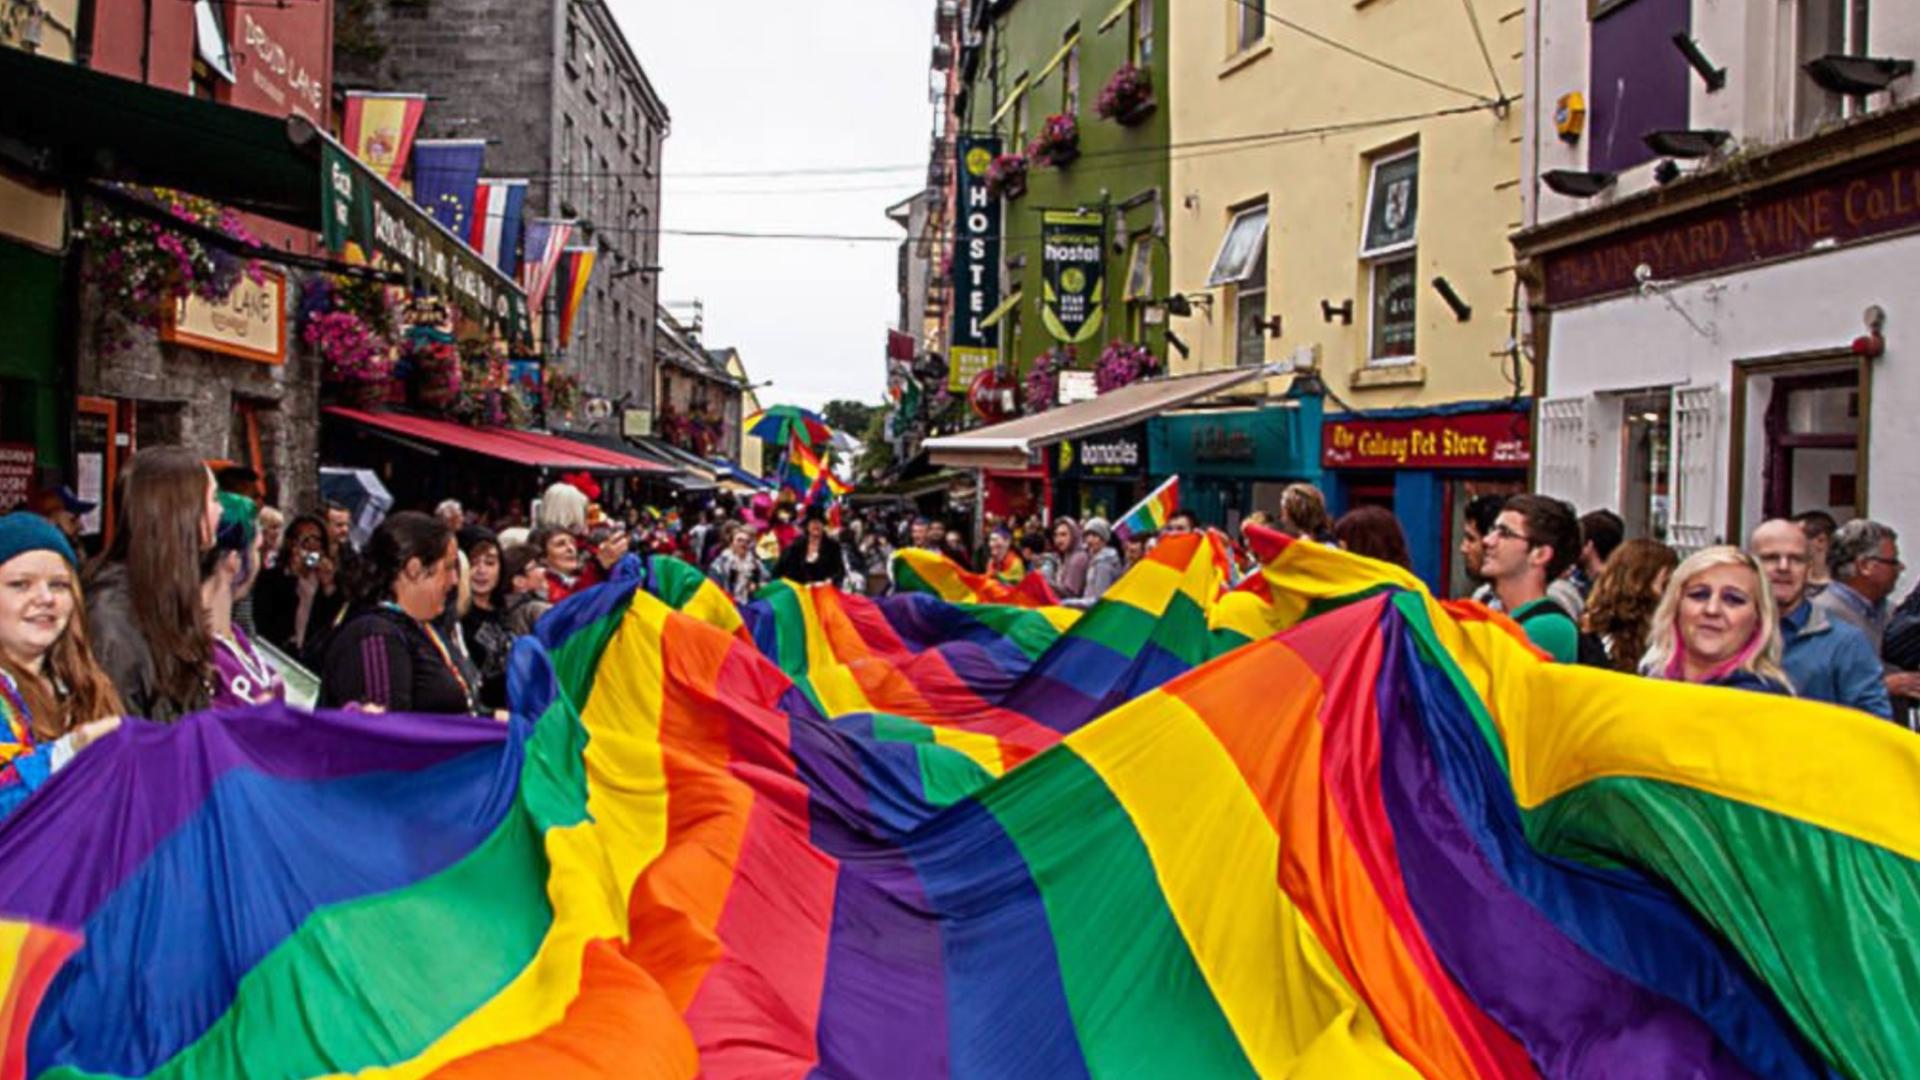 Galway Gay Men, Galway Gay Dating, Galway Gay - RealJock